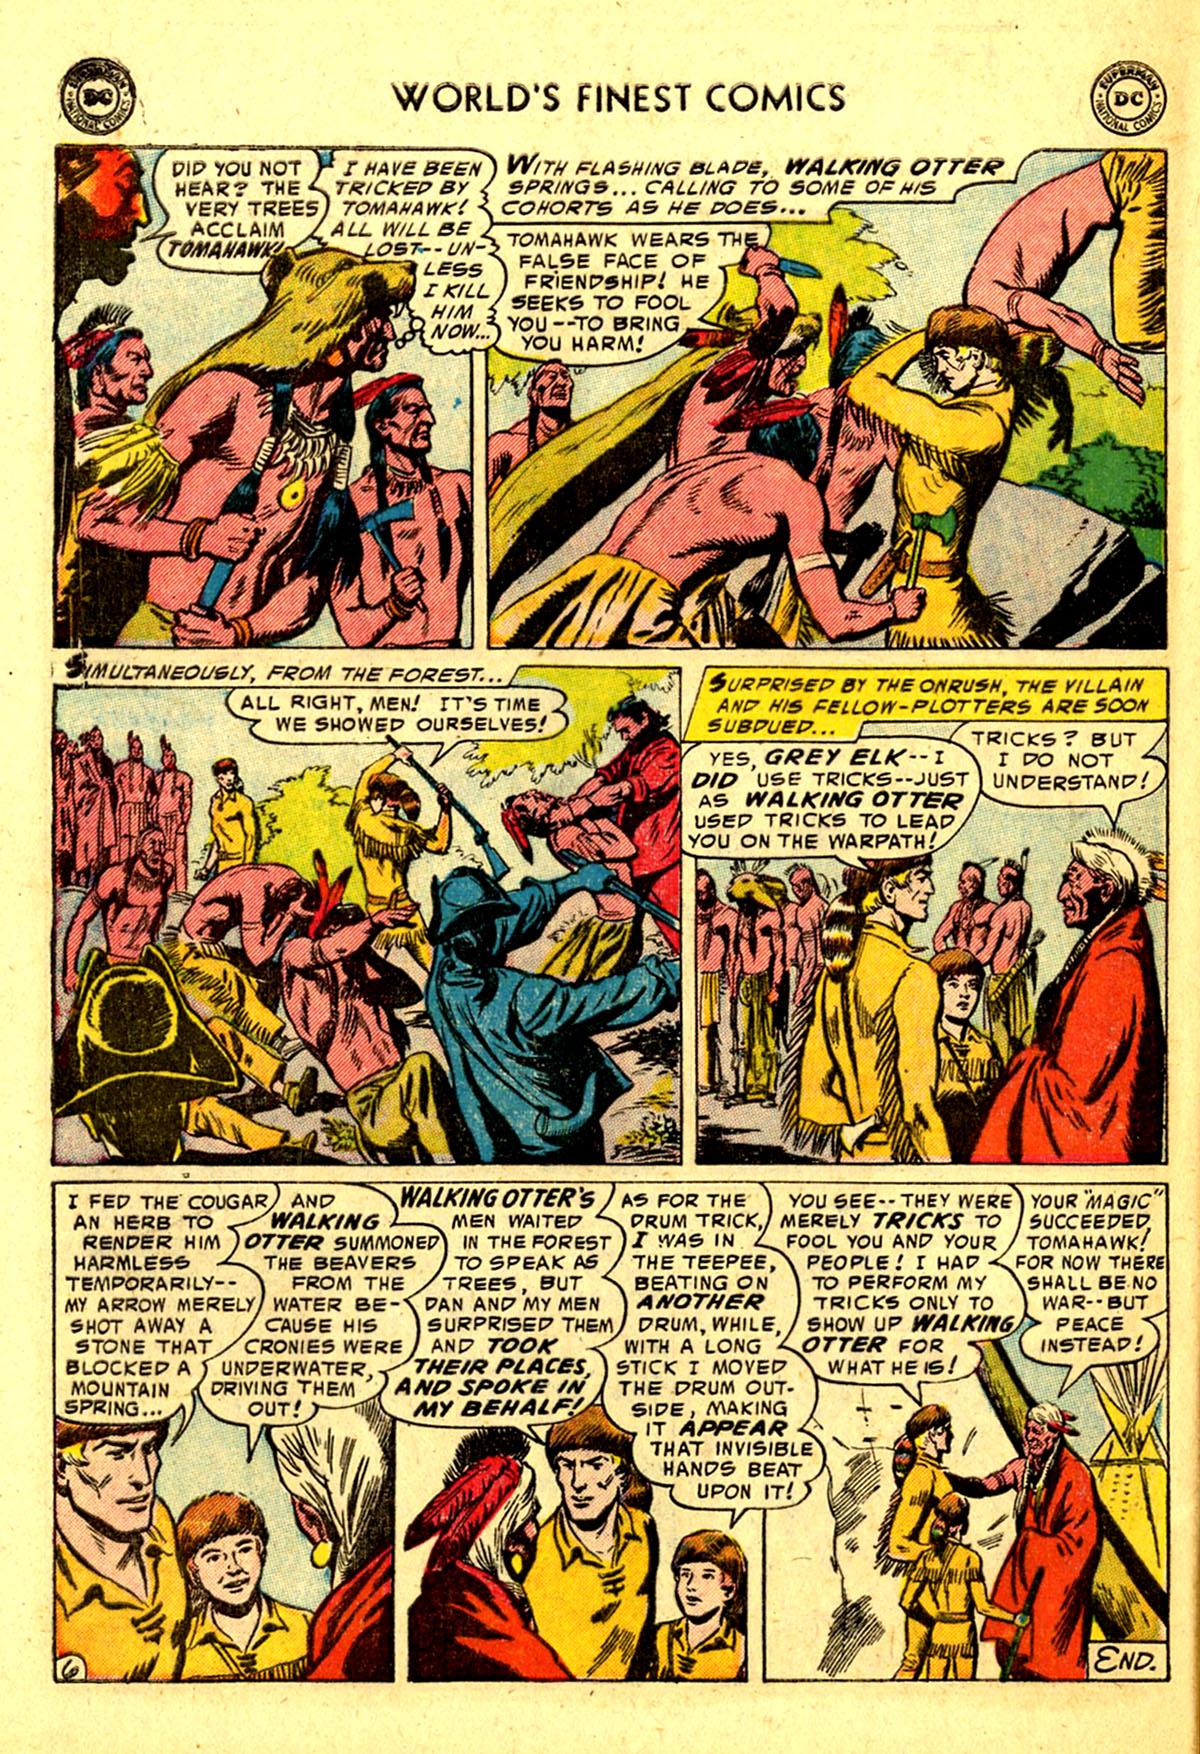 Read online World's Finest Comics comic -  Issue #75 - 32